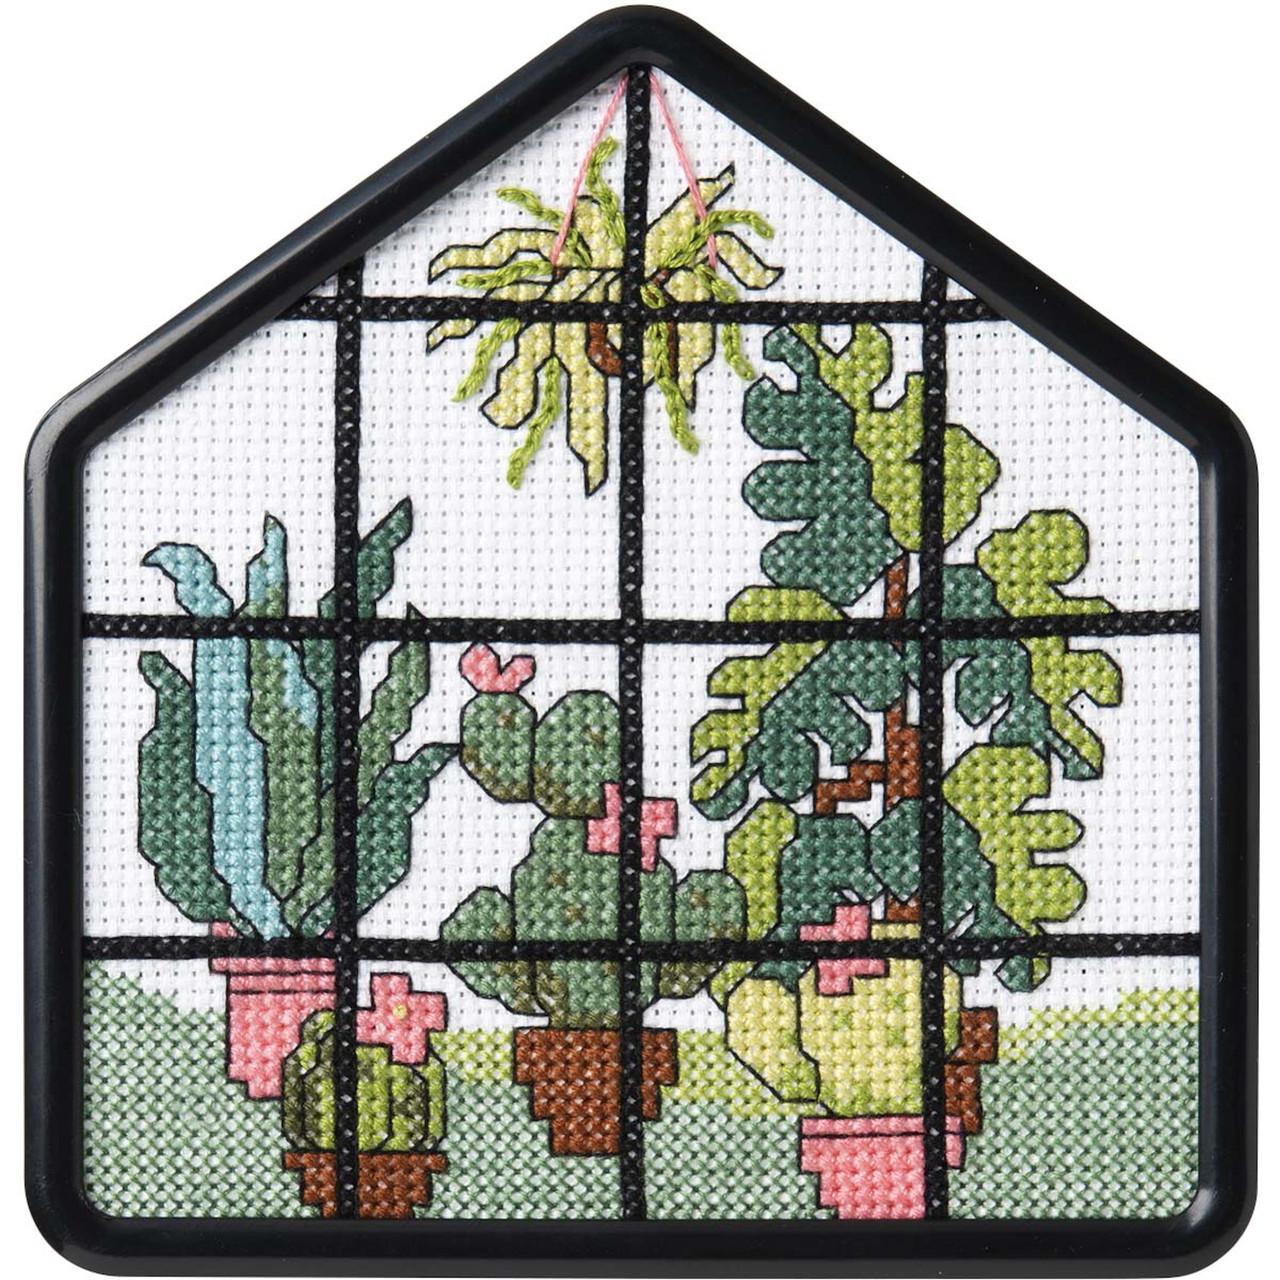 My 1st Stitch - Greenhouse